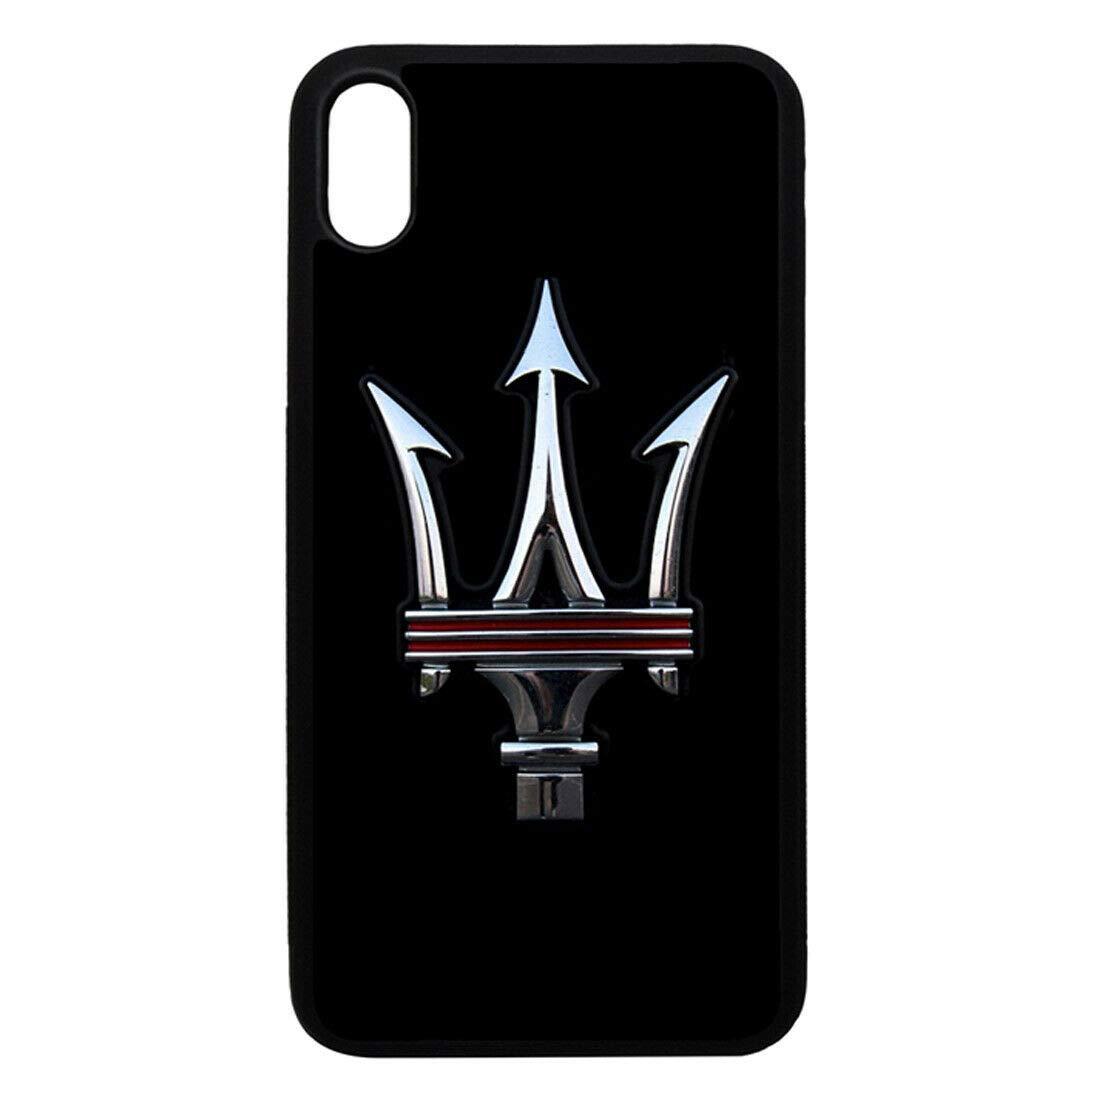 Hermosa funda de celular con la marca Maseratihttps://amzn.to/2WnmFuX